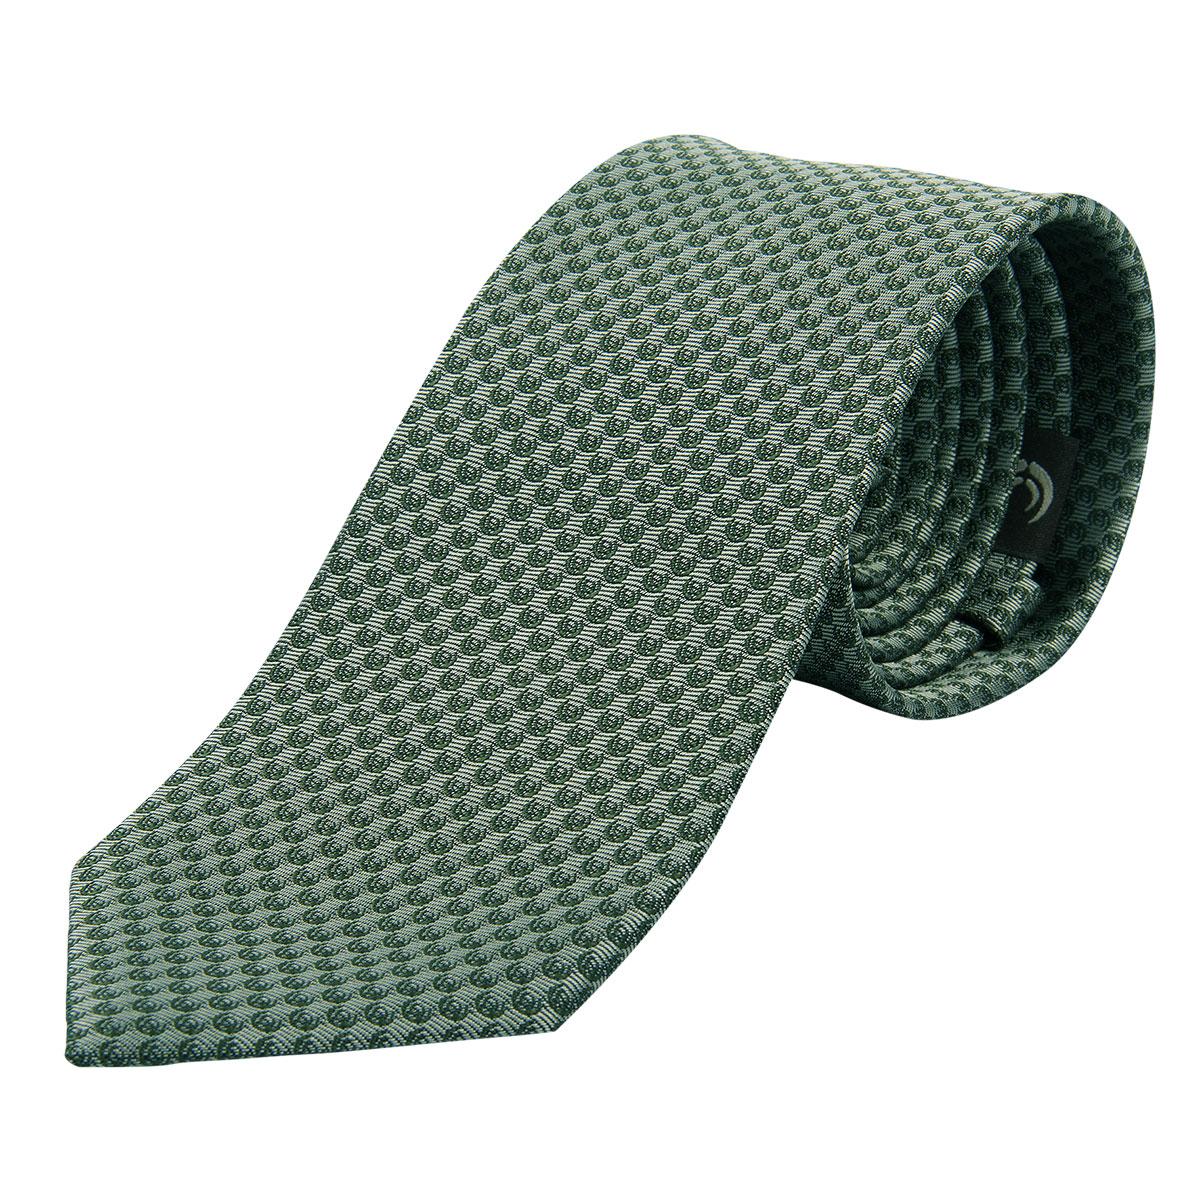 "KEYLER Krawatte ""Basse"" Schilf/Dunkelgrün im Pareyshop"